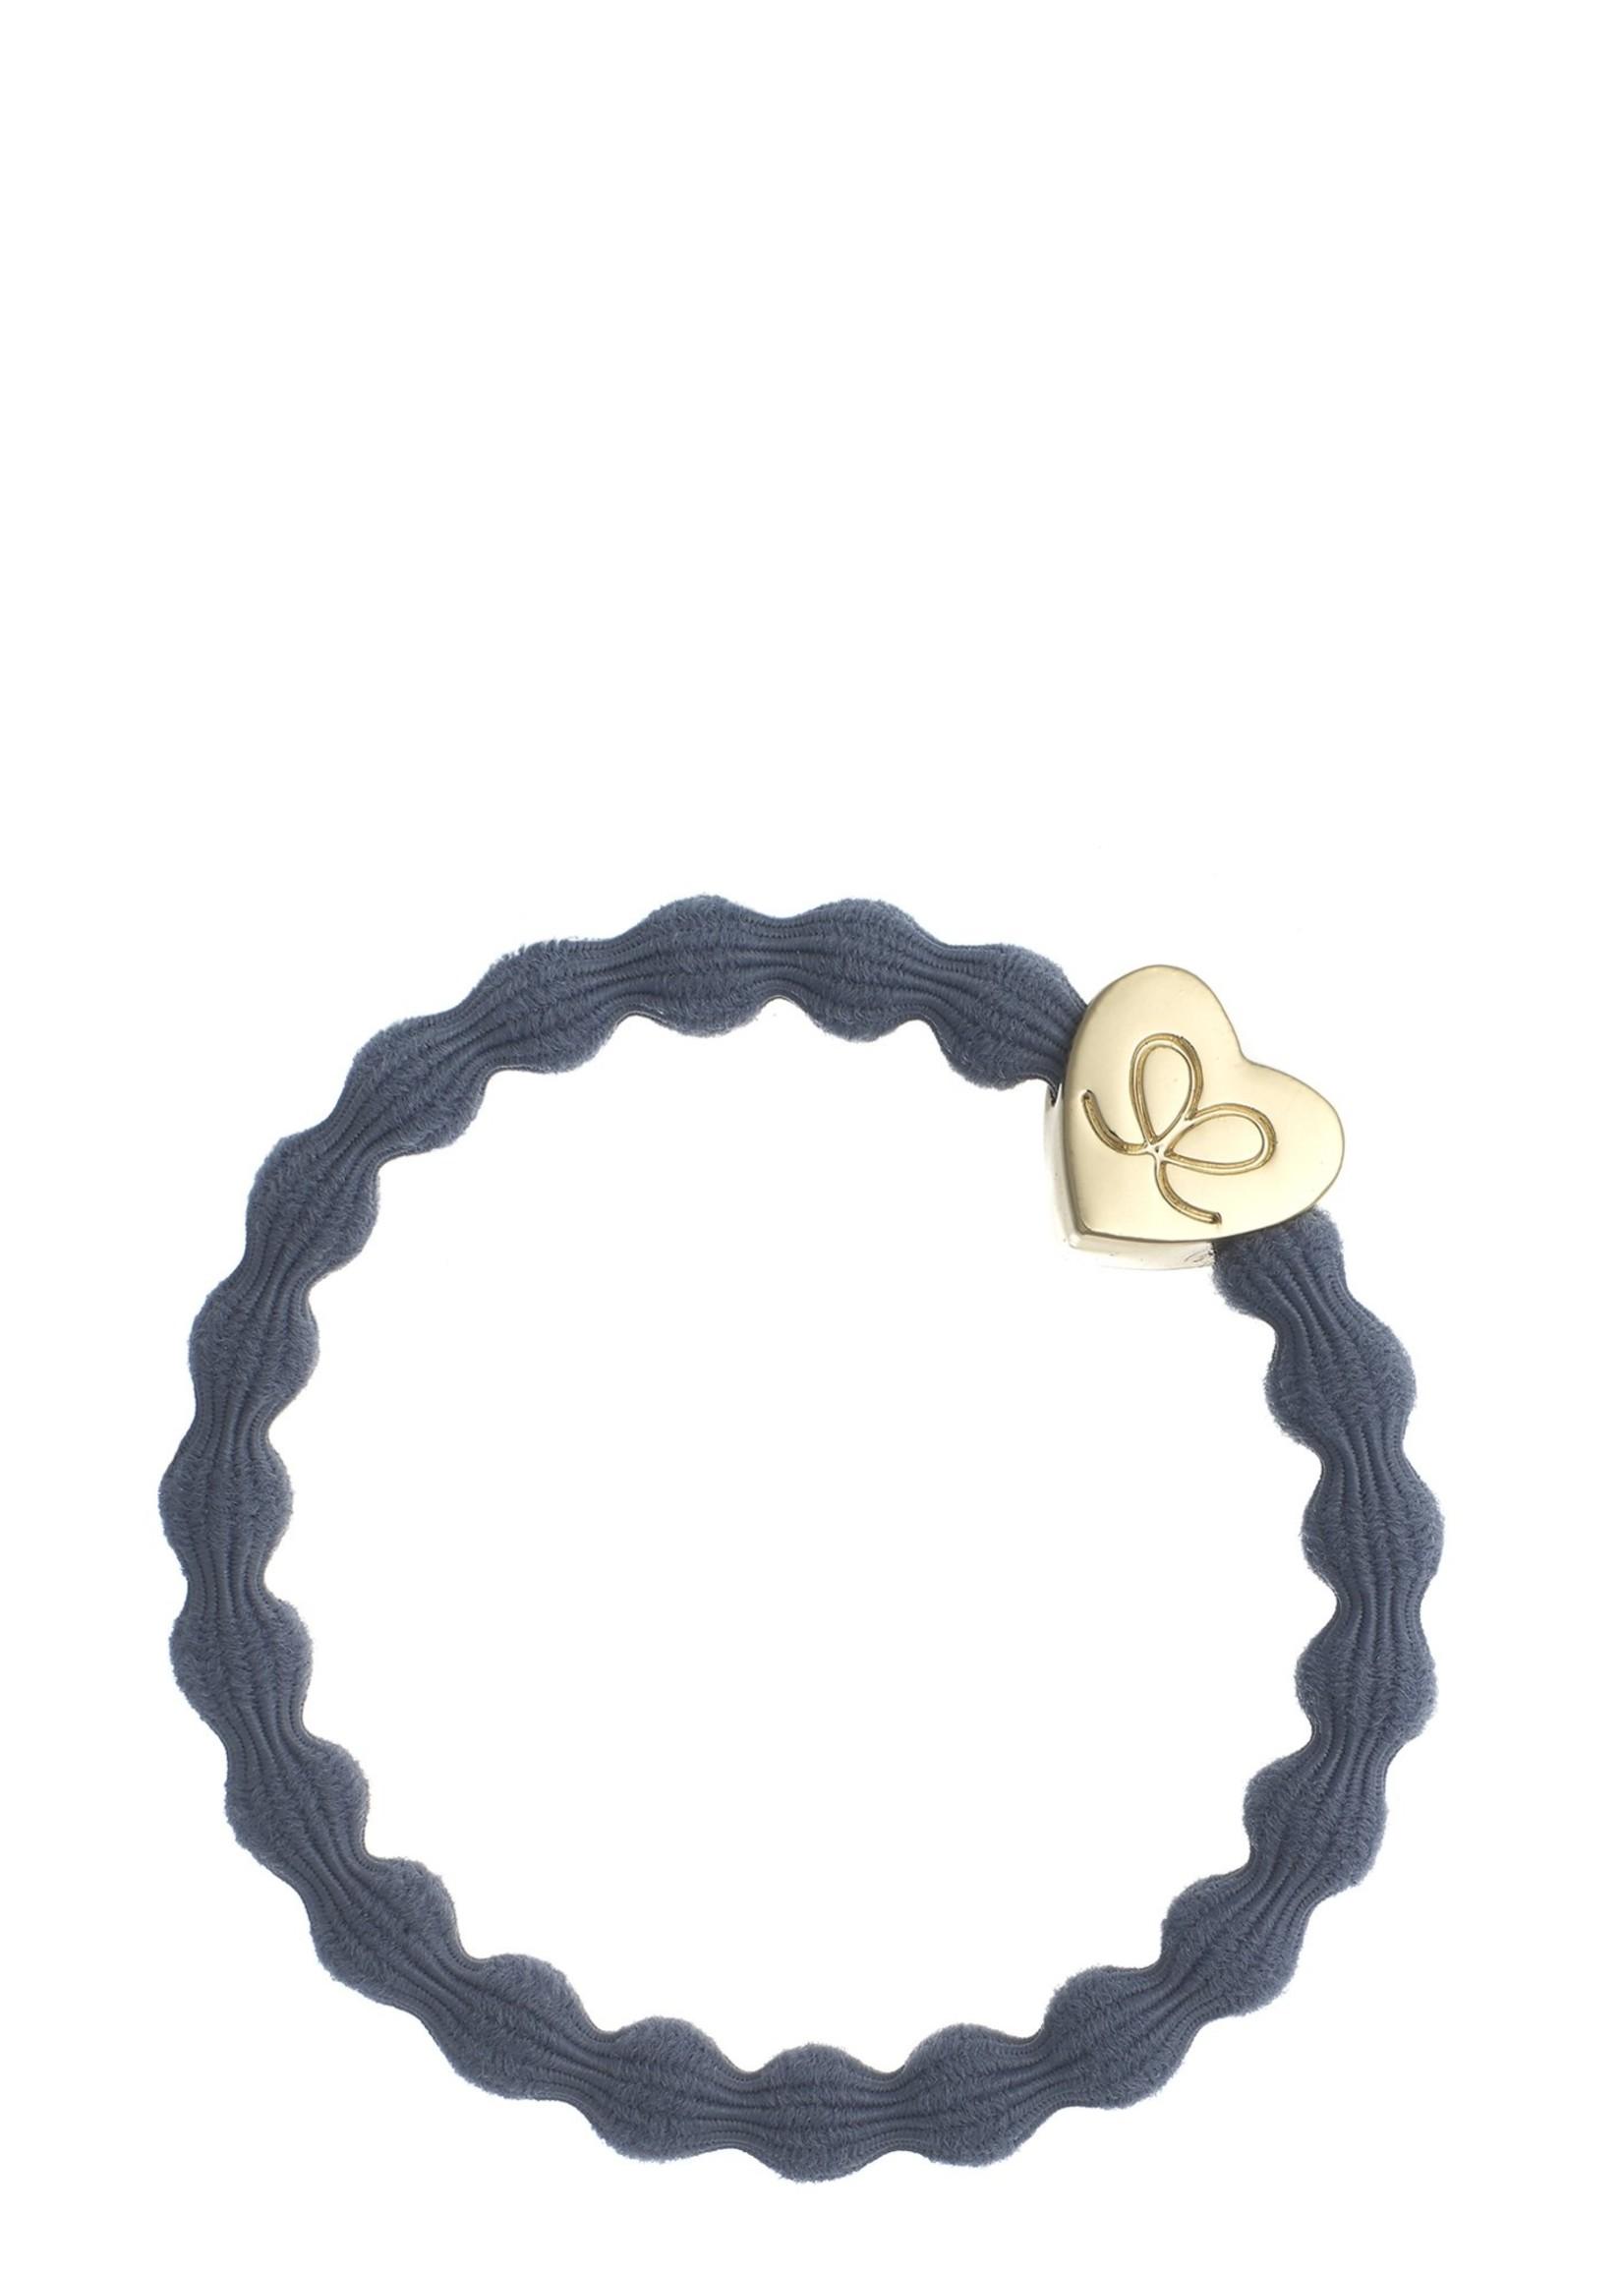 By Eloise Gold Heart Hair Tie